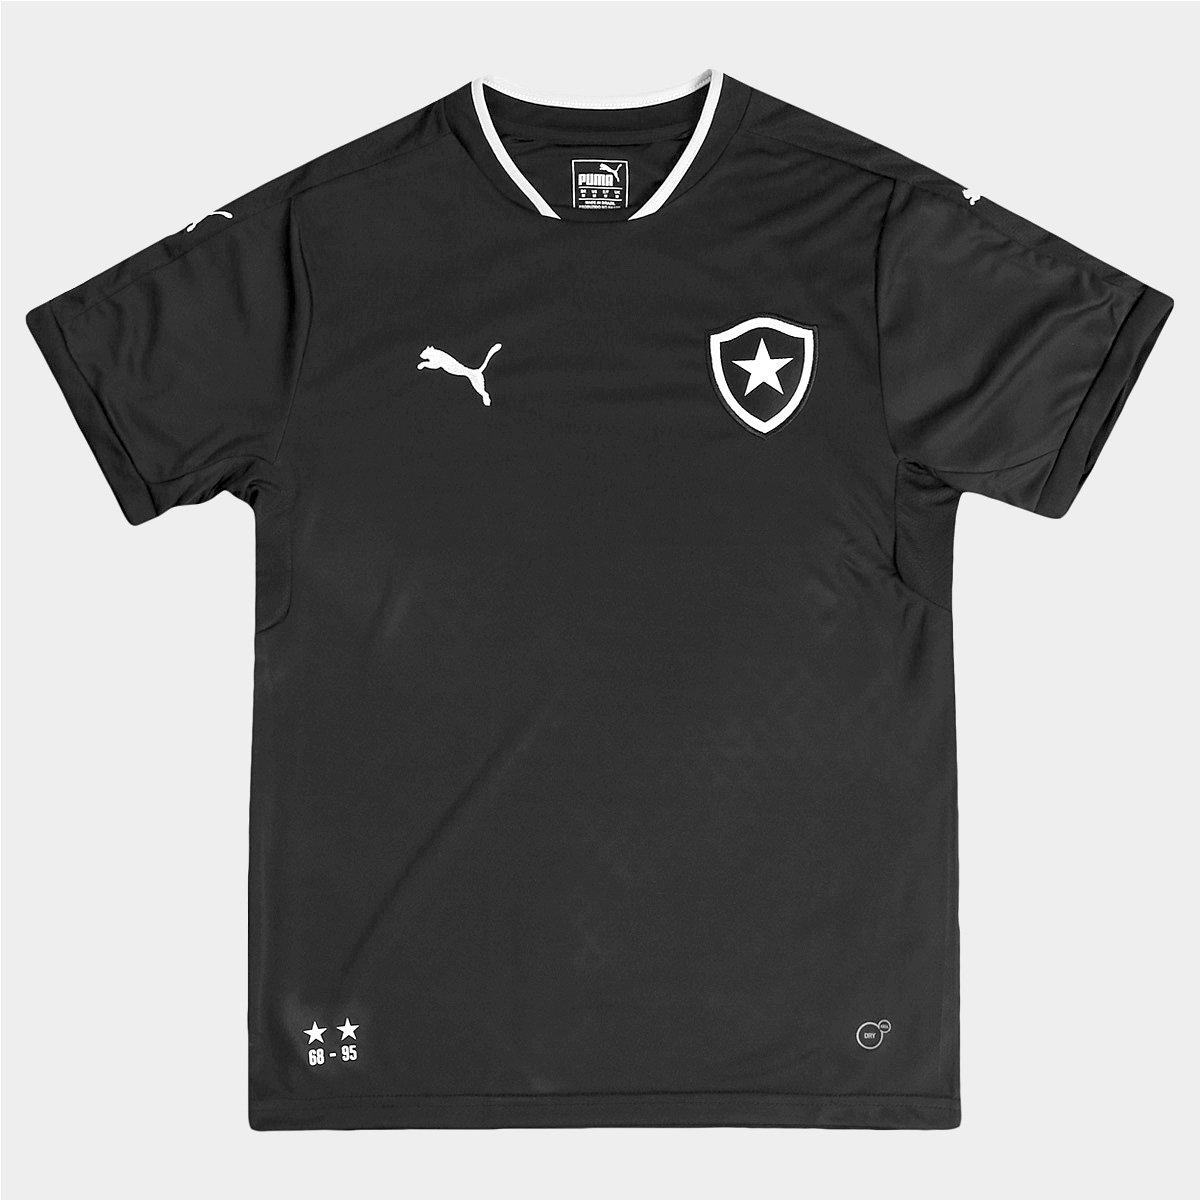 Camisa Botafogo II 15 16 s nº - Torcedor Puma Masculina - Compre Agora  7aa59c0320bc8